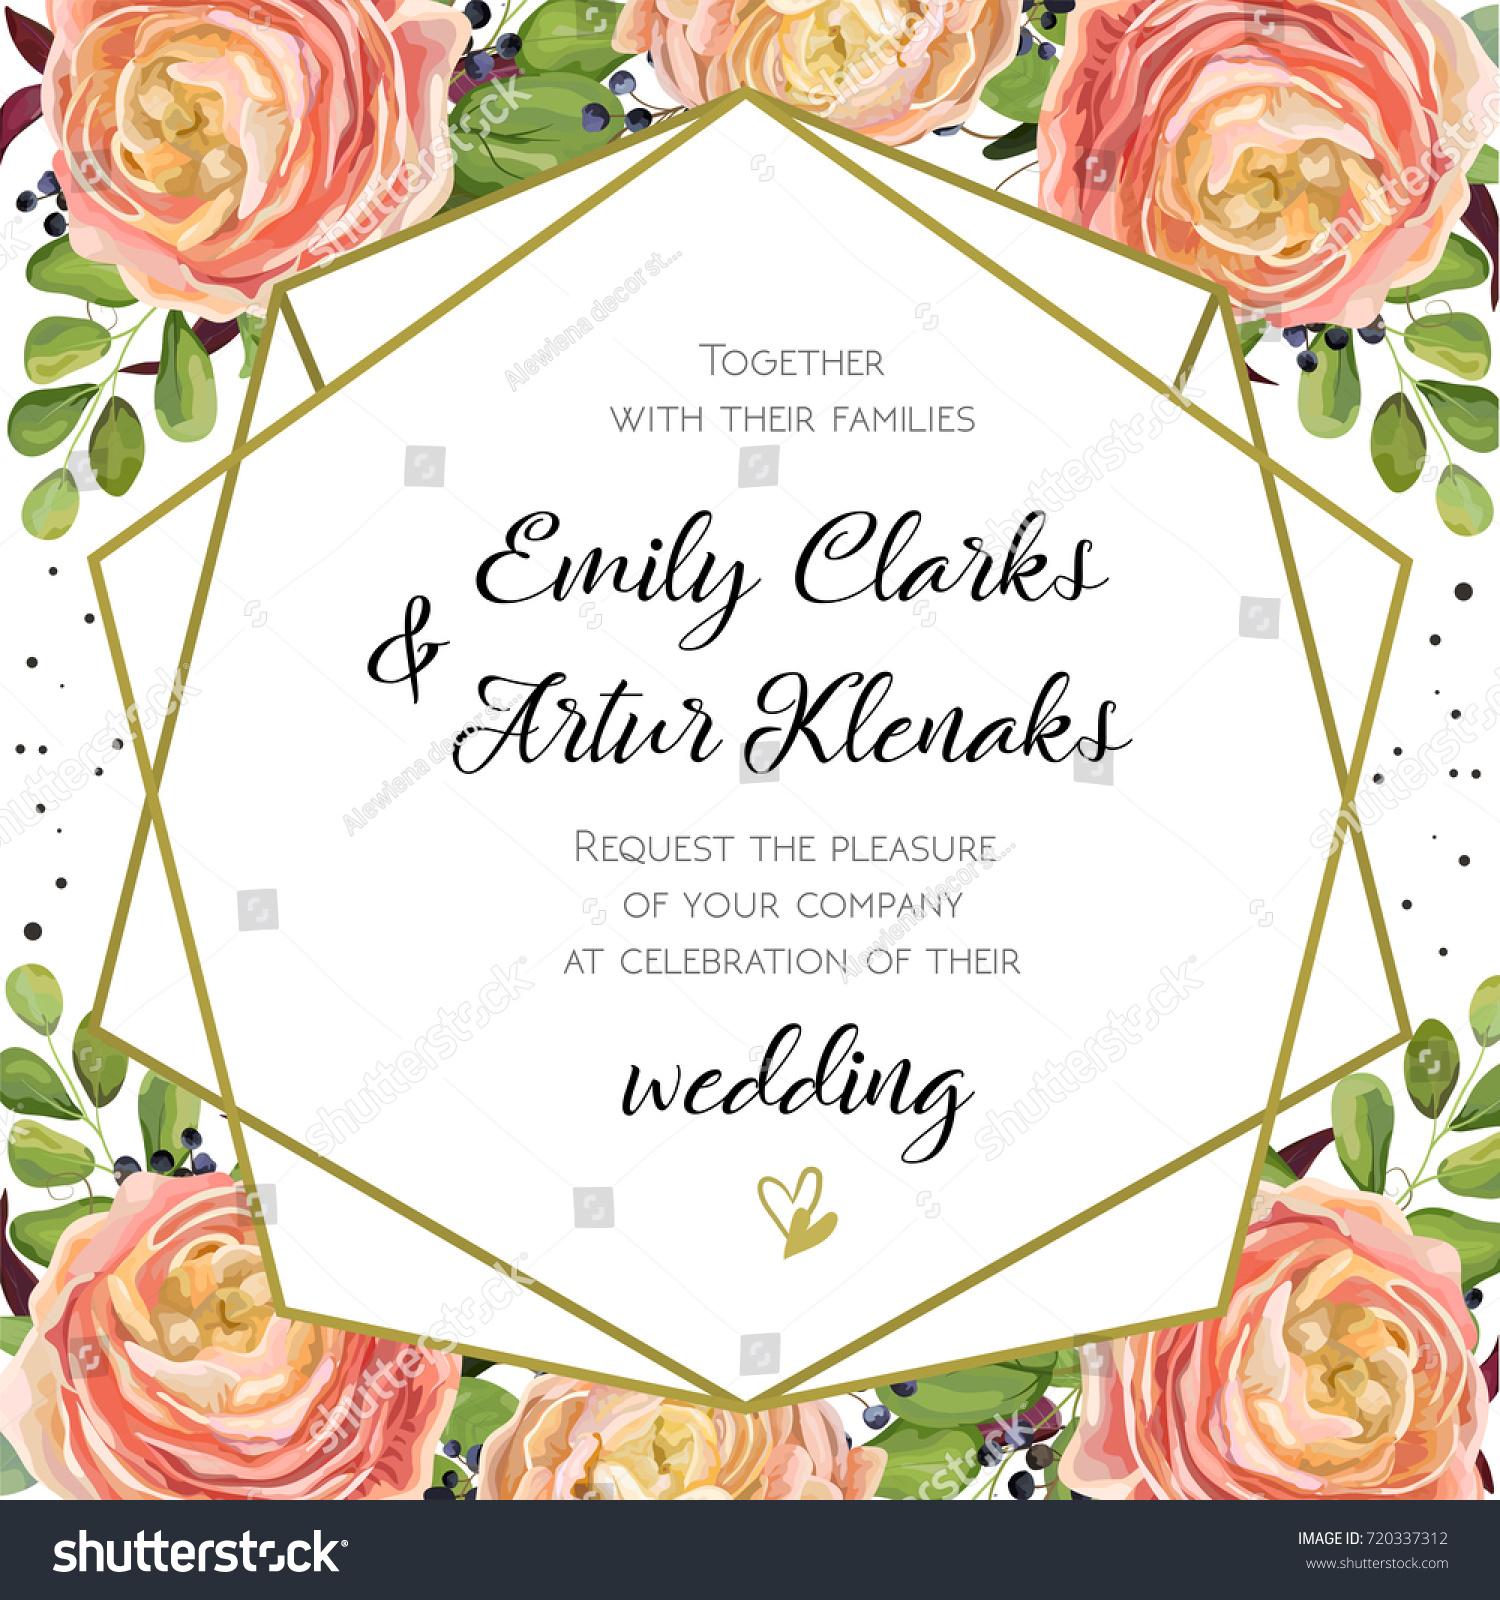 5 Blue Floral Wedding Invitation Card Vector Material: Wedding Invitation Floral Invite Card Design Stock Vector